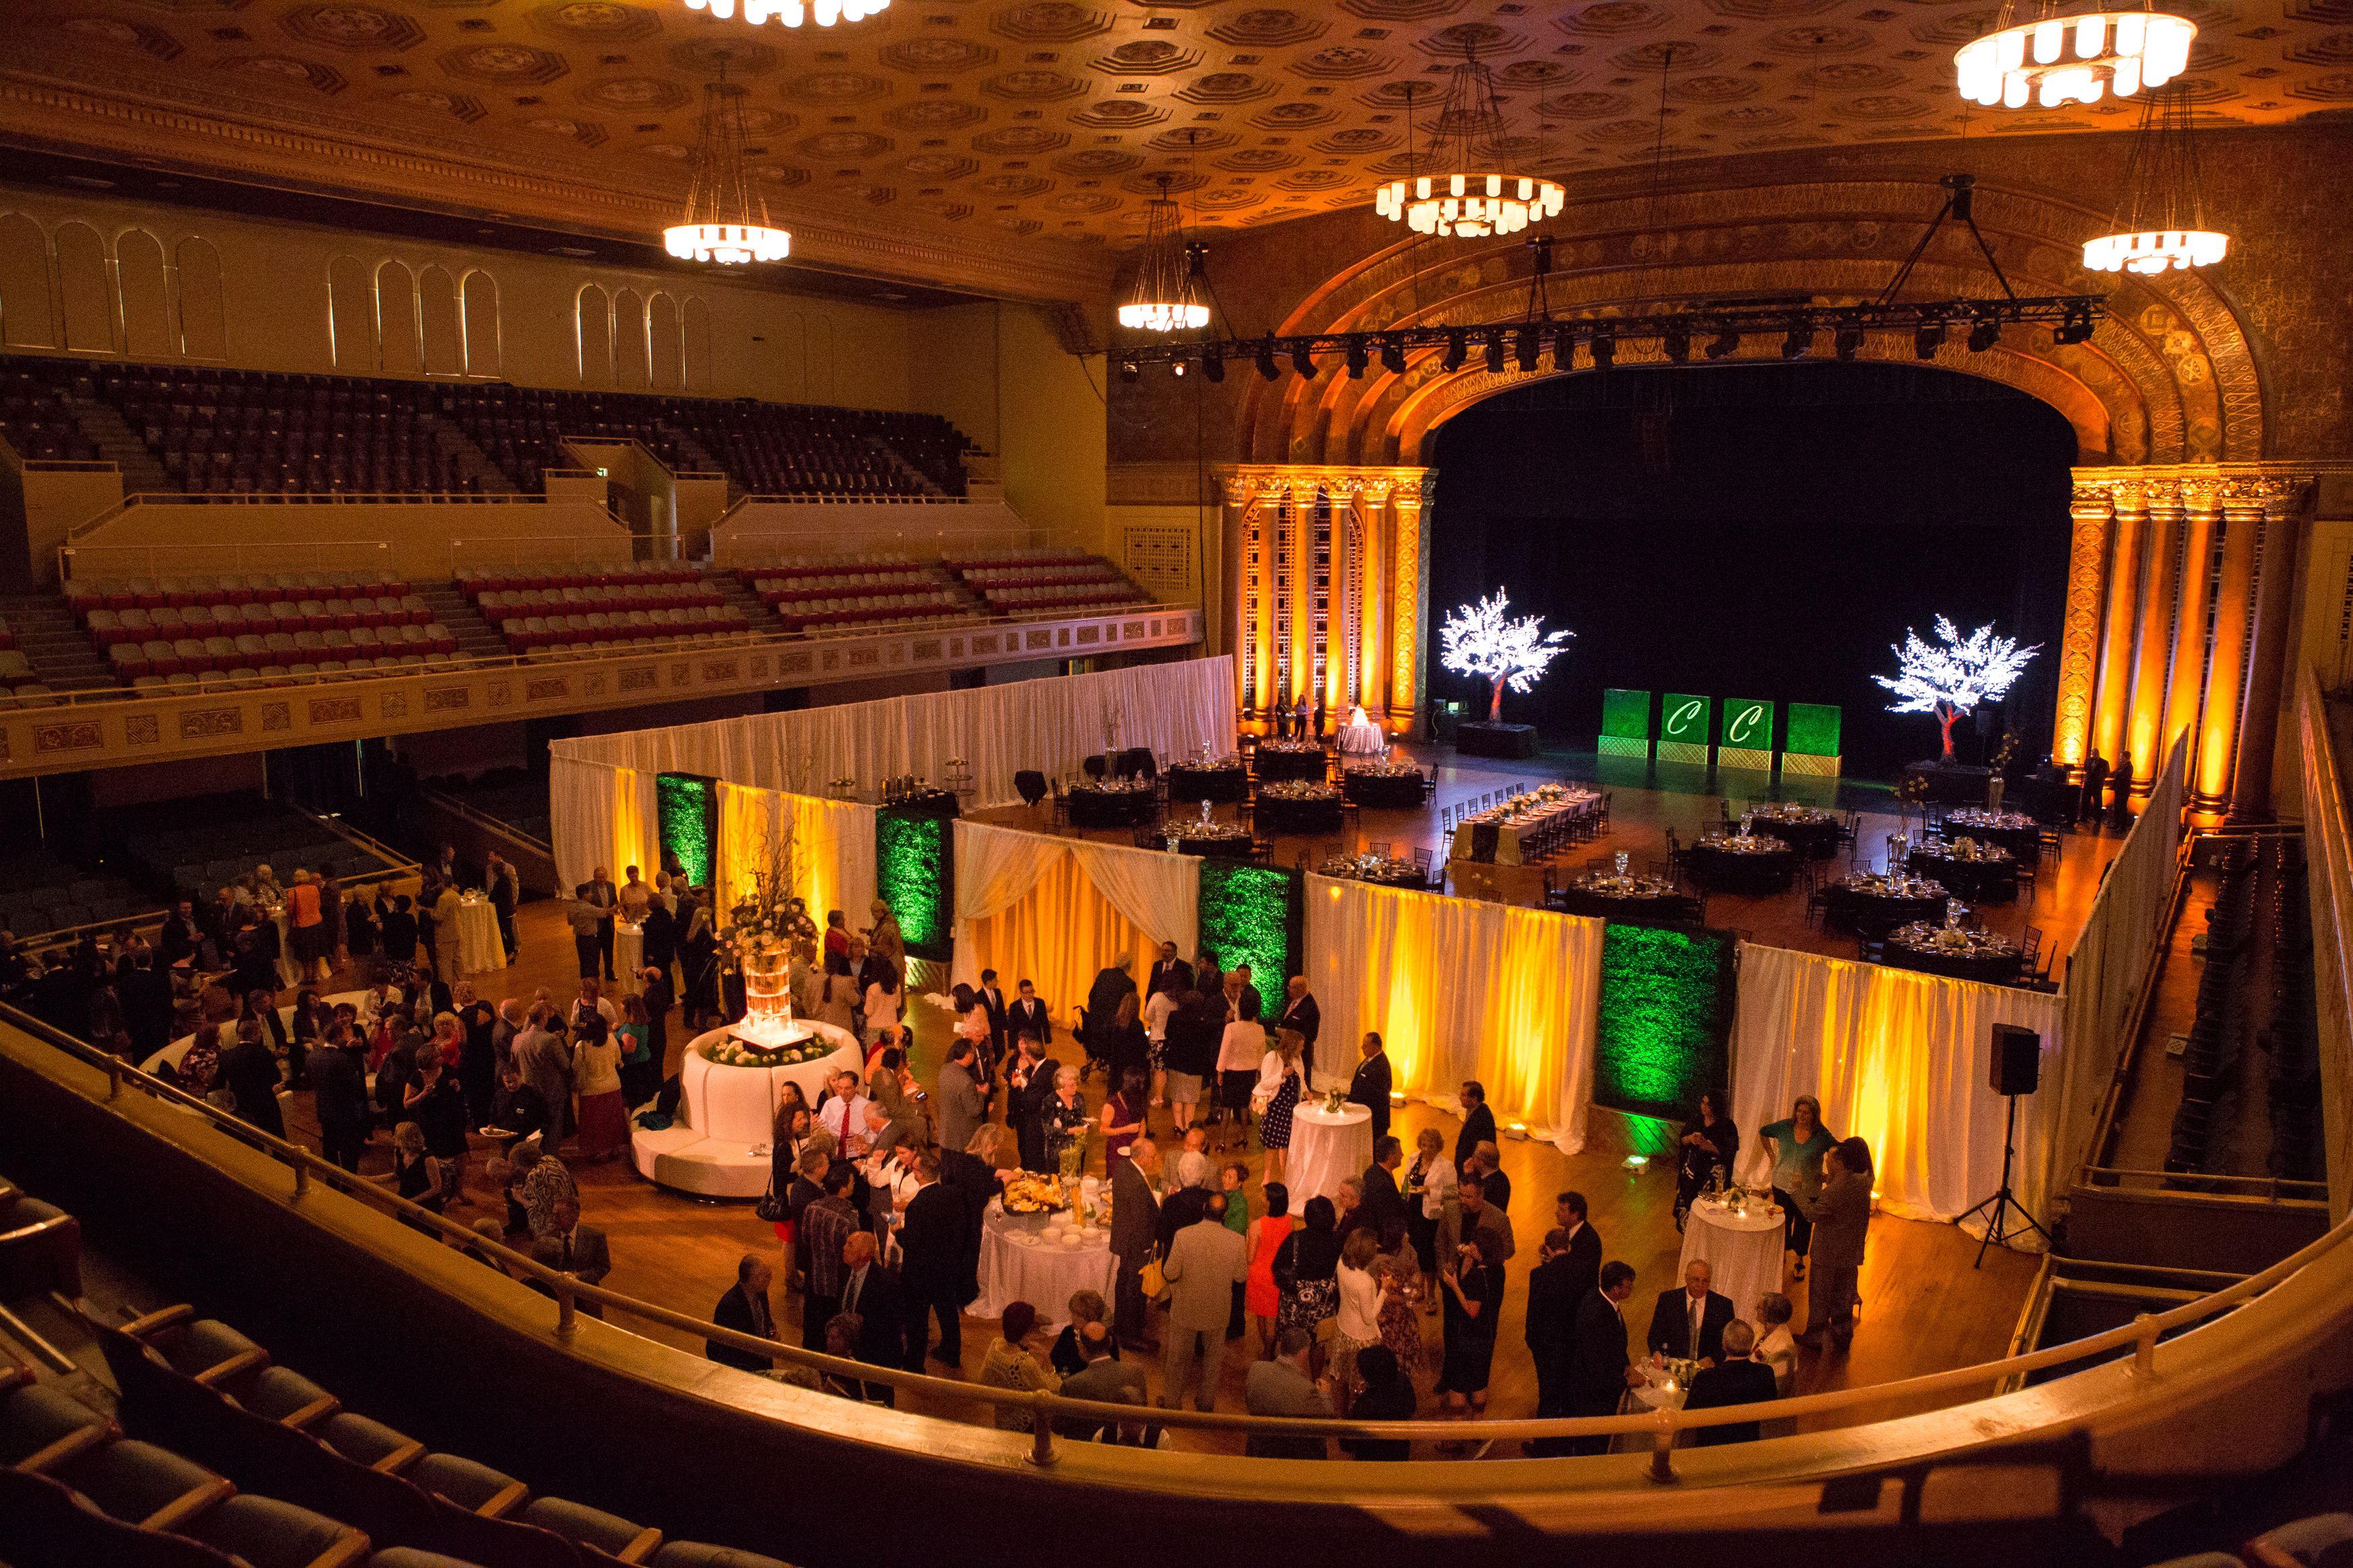 View Of Memorial Auditorium Main Floor From Balcony The Main Floor Of Memorial Auditorium Stage Was Divided Into Auditorium Seating Seating Charts Auditorium